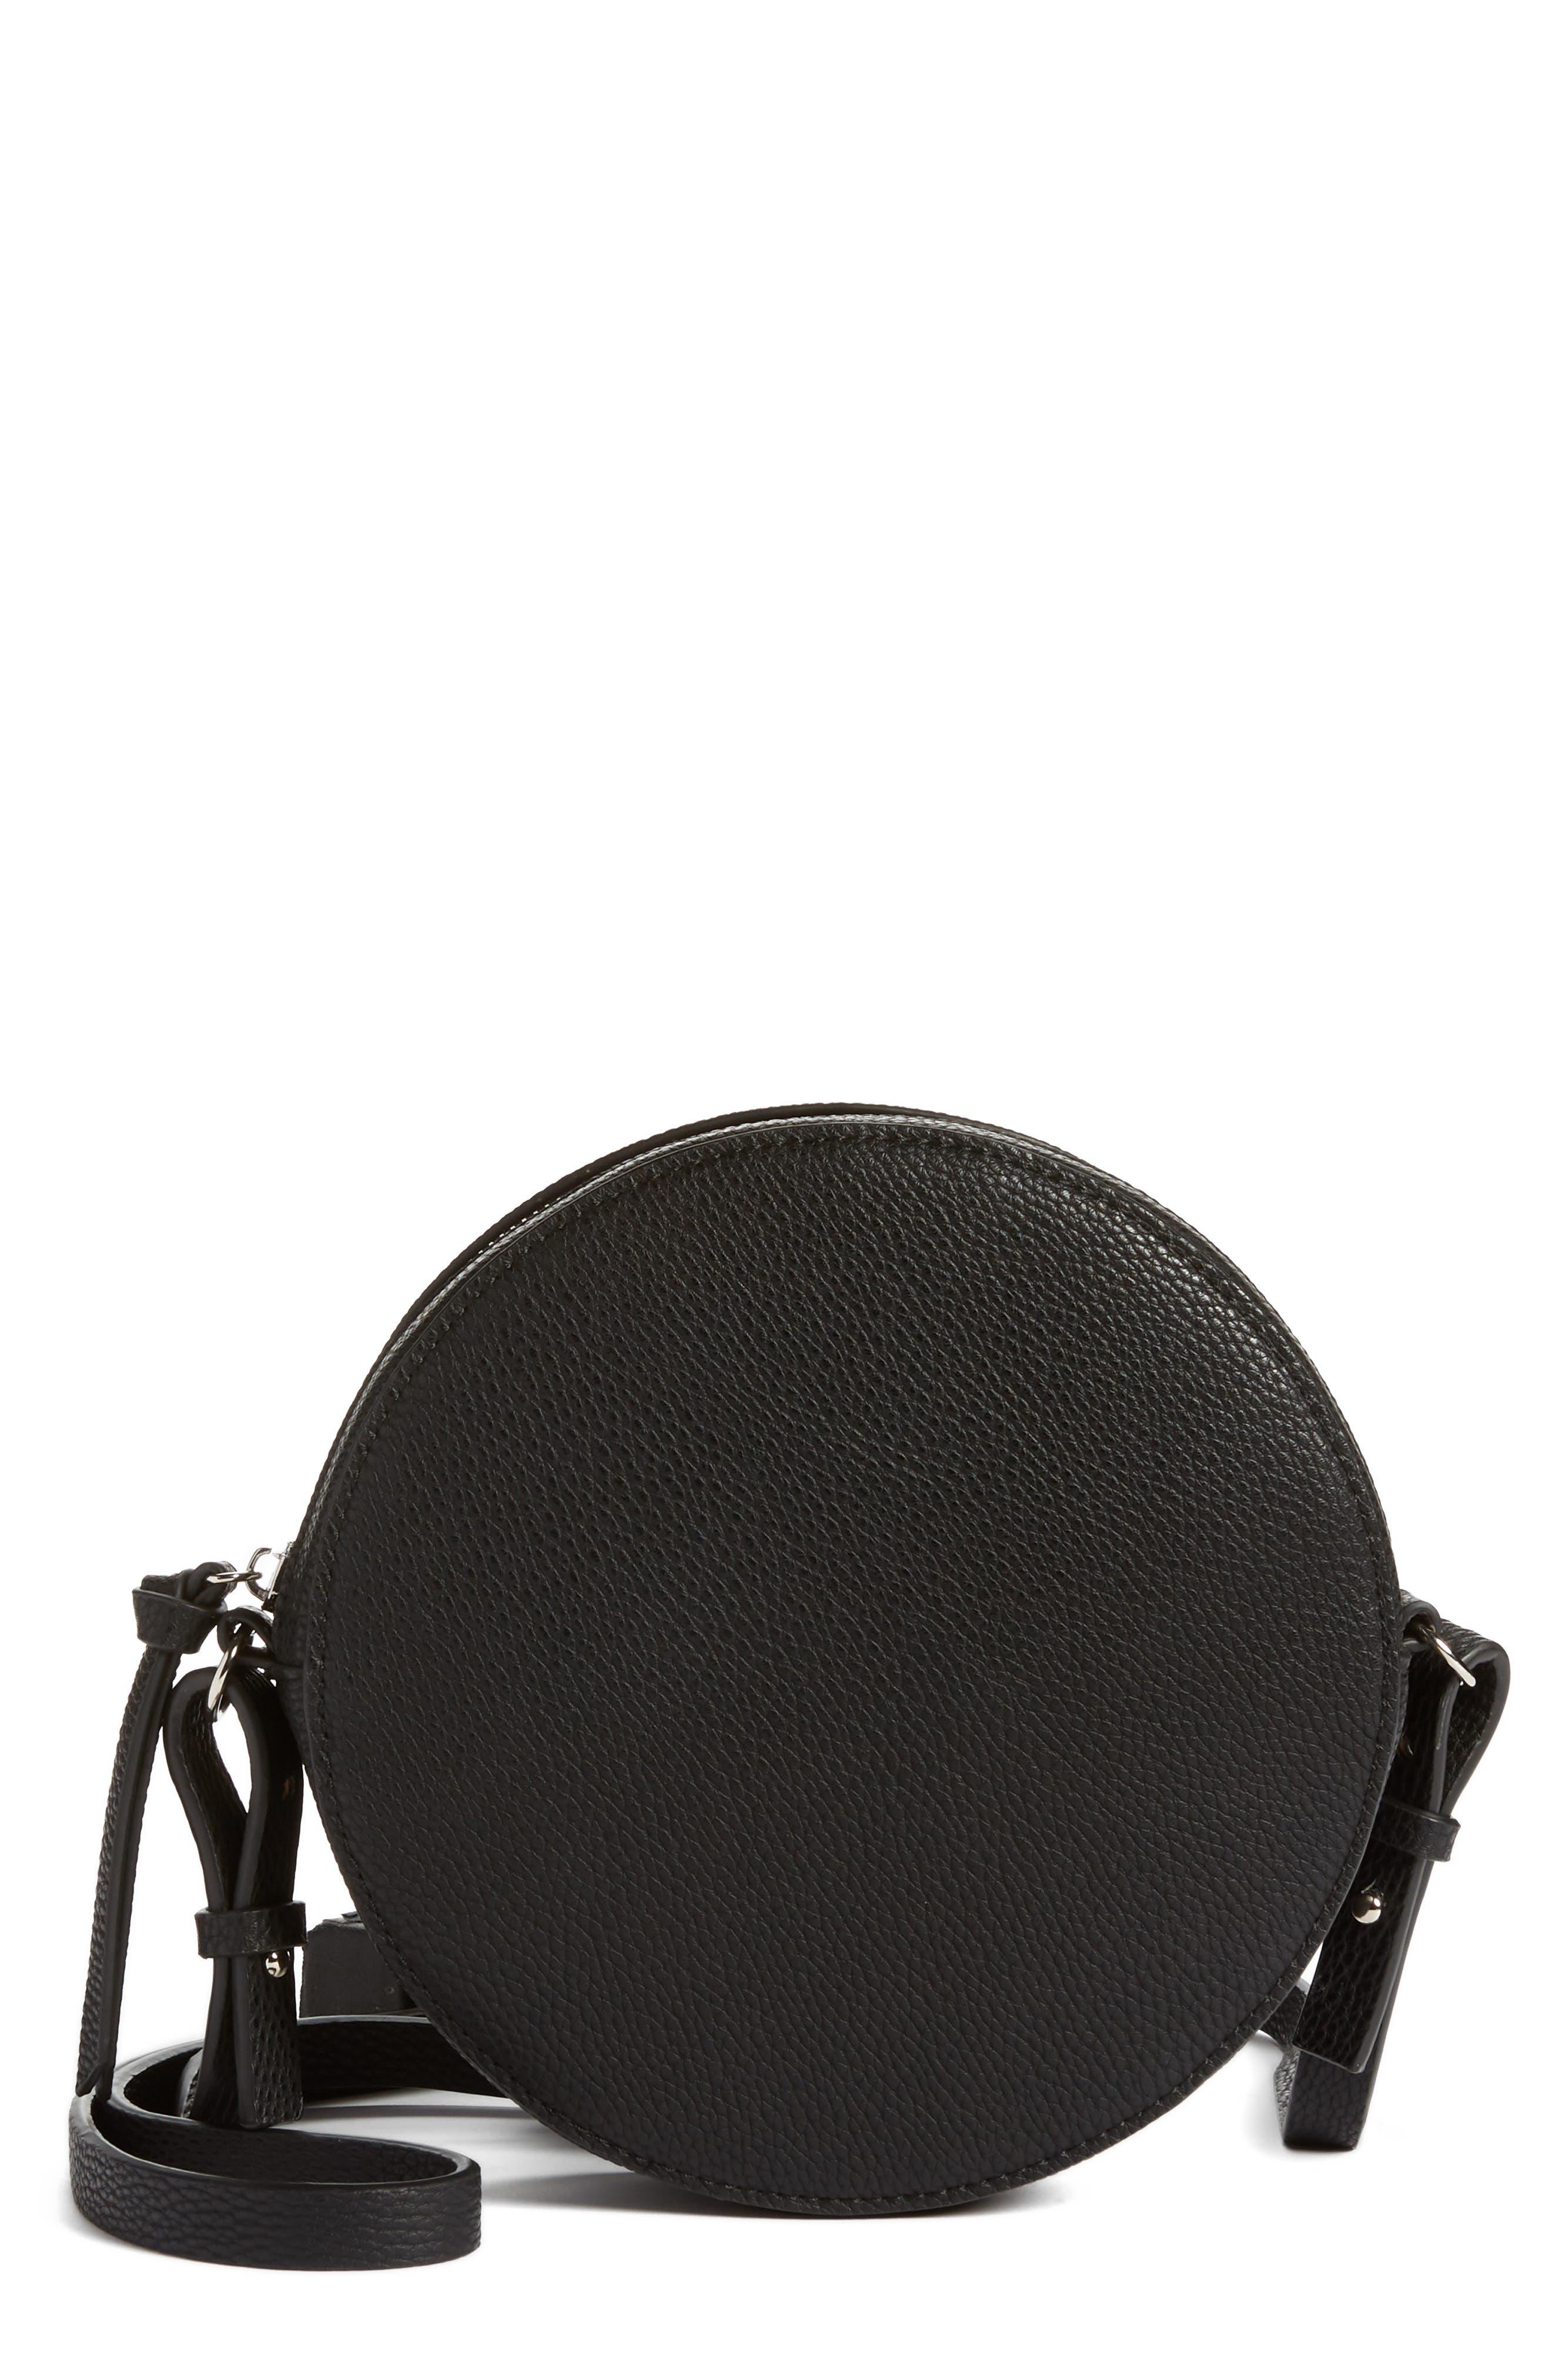 Chelsea28 Cassie Faux Leather Crossbody Bag